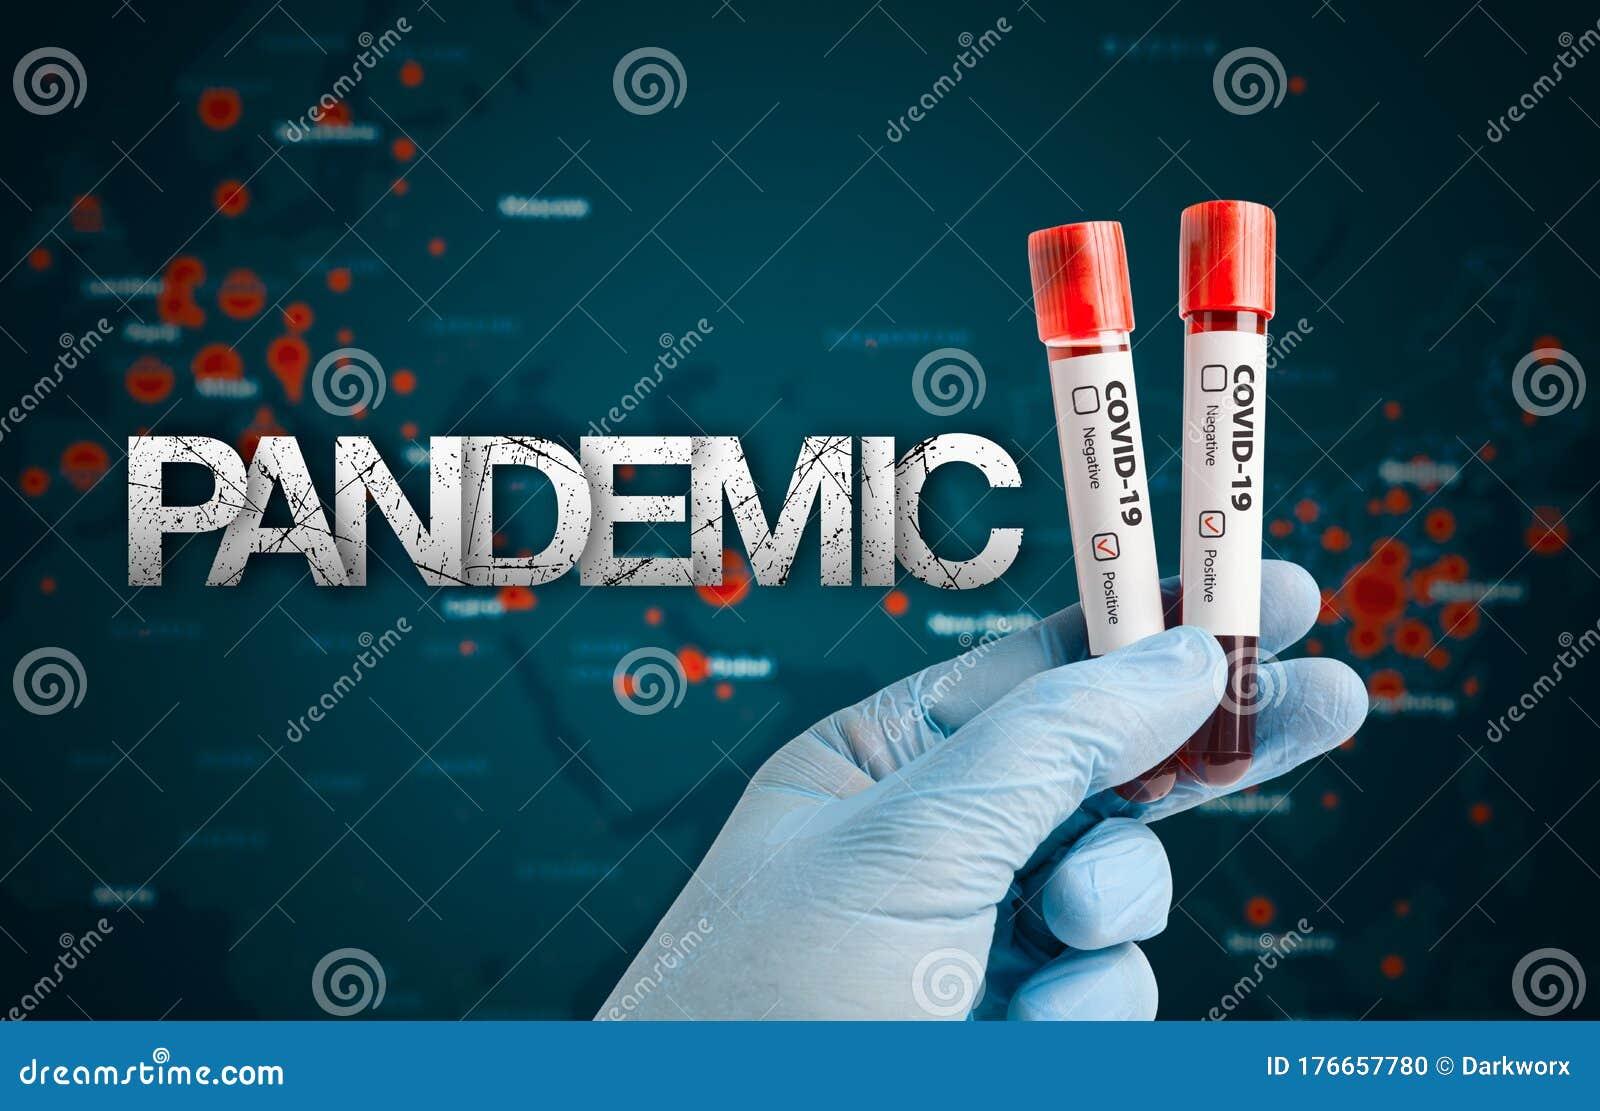 Coronavirus Concept With Pandemic Message Stock Photo ...